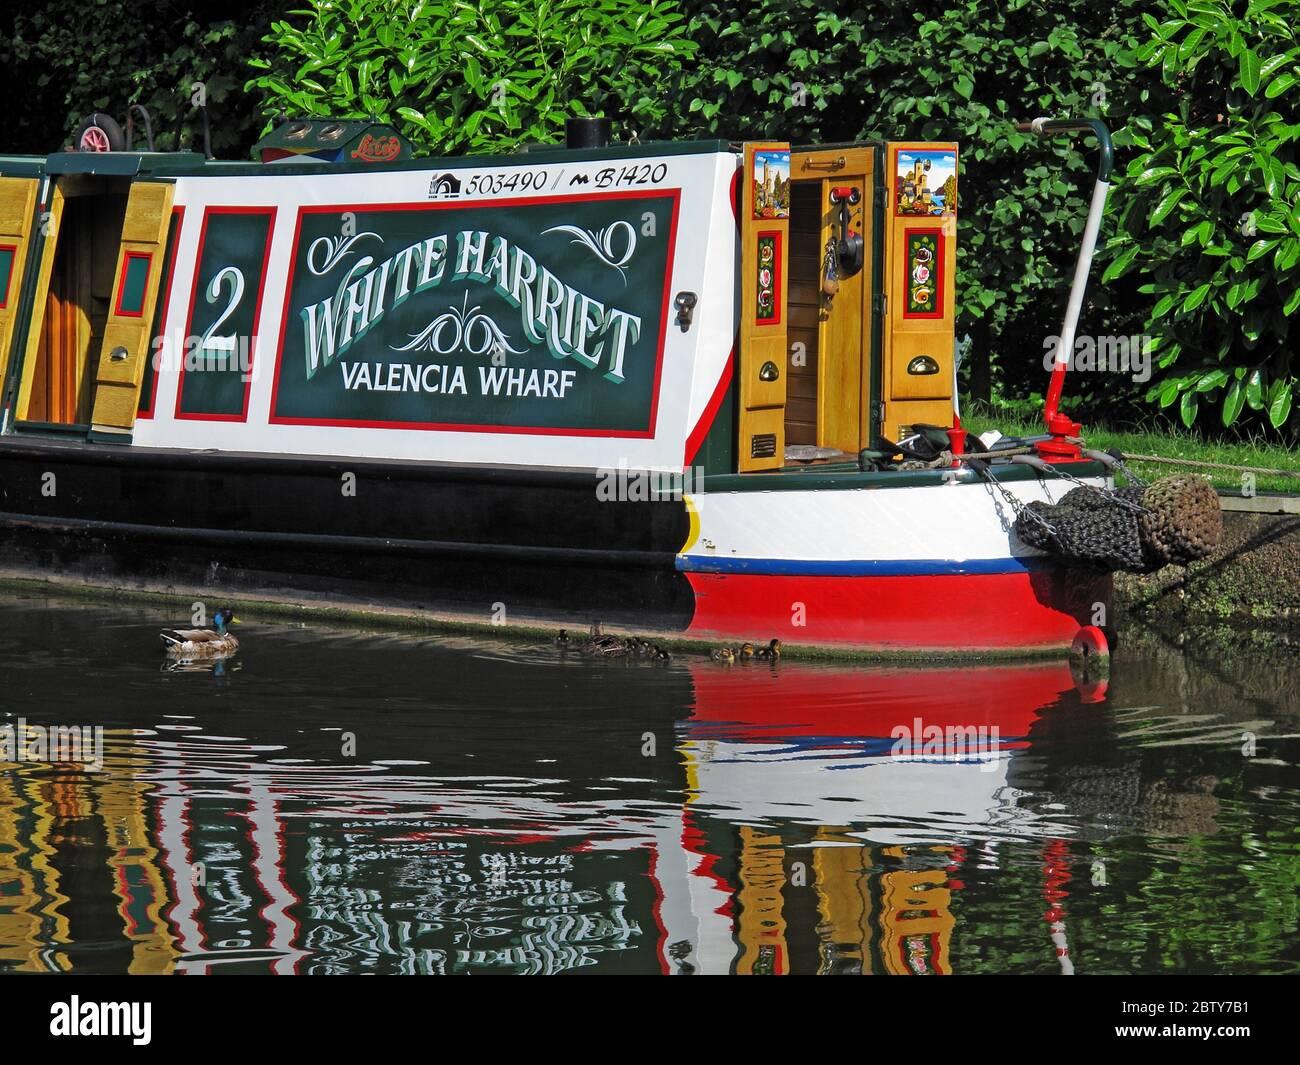 HotpixUk,@HotpixUK,GoTonySmith,Cheshire,England,UK,reflection,barges,503490 B1420,boat,navigation,transport,decorative,Waterway,British,Canal and river trust,historic,history